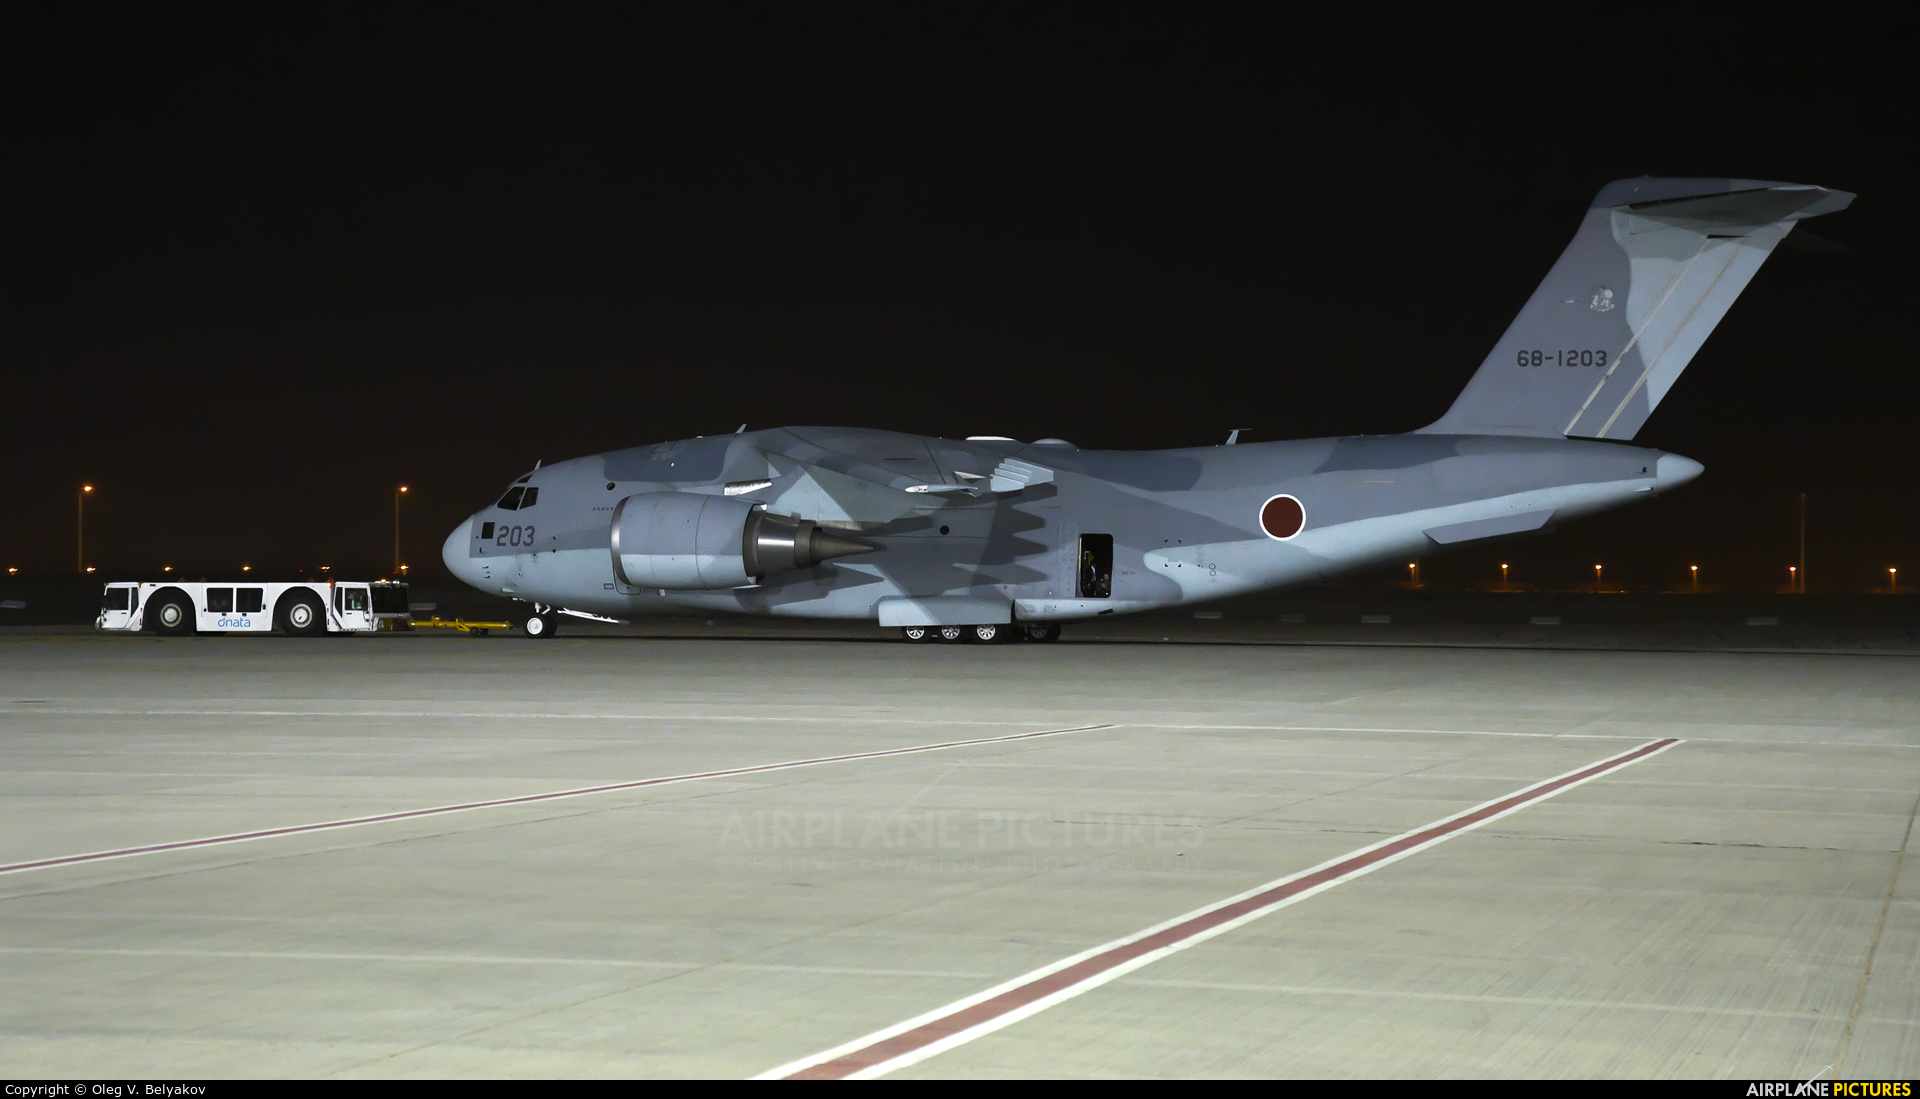 Japan - Air Self Defence Force 68-1203 aircraft at Jebel Ali Al Maktoum Intl